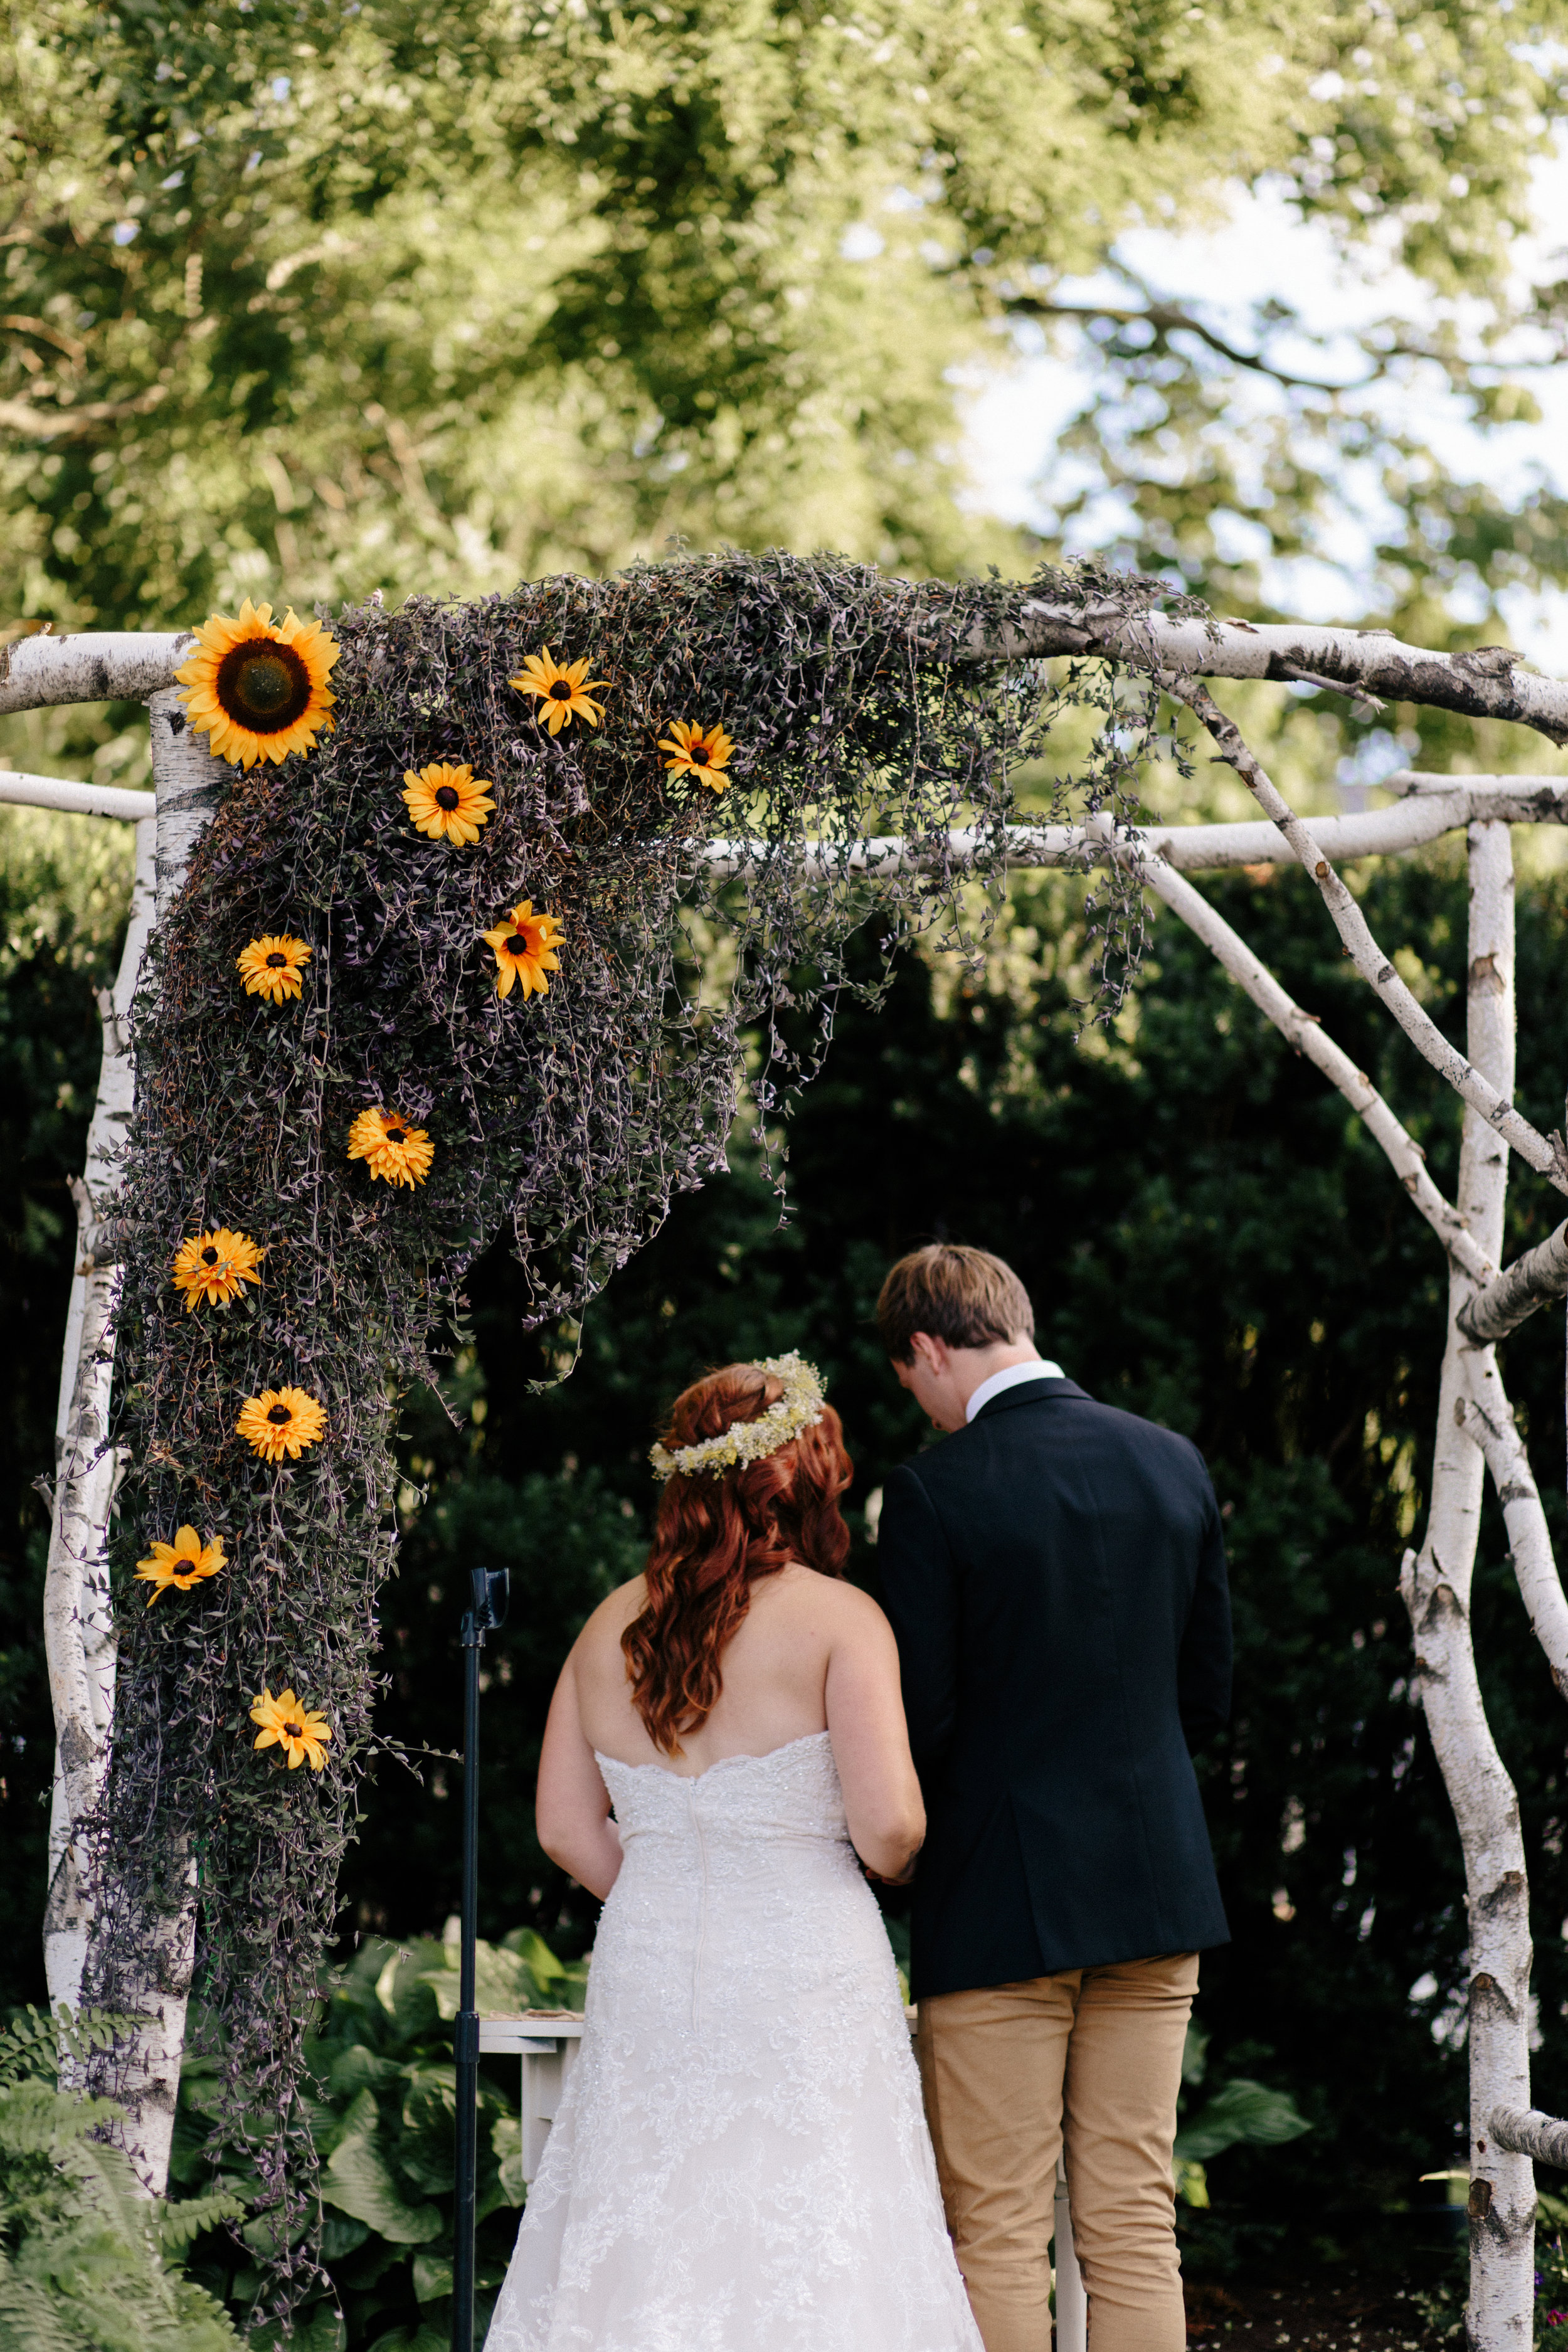 saundra_megan_photo_wedding_photography5.jpg